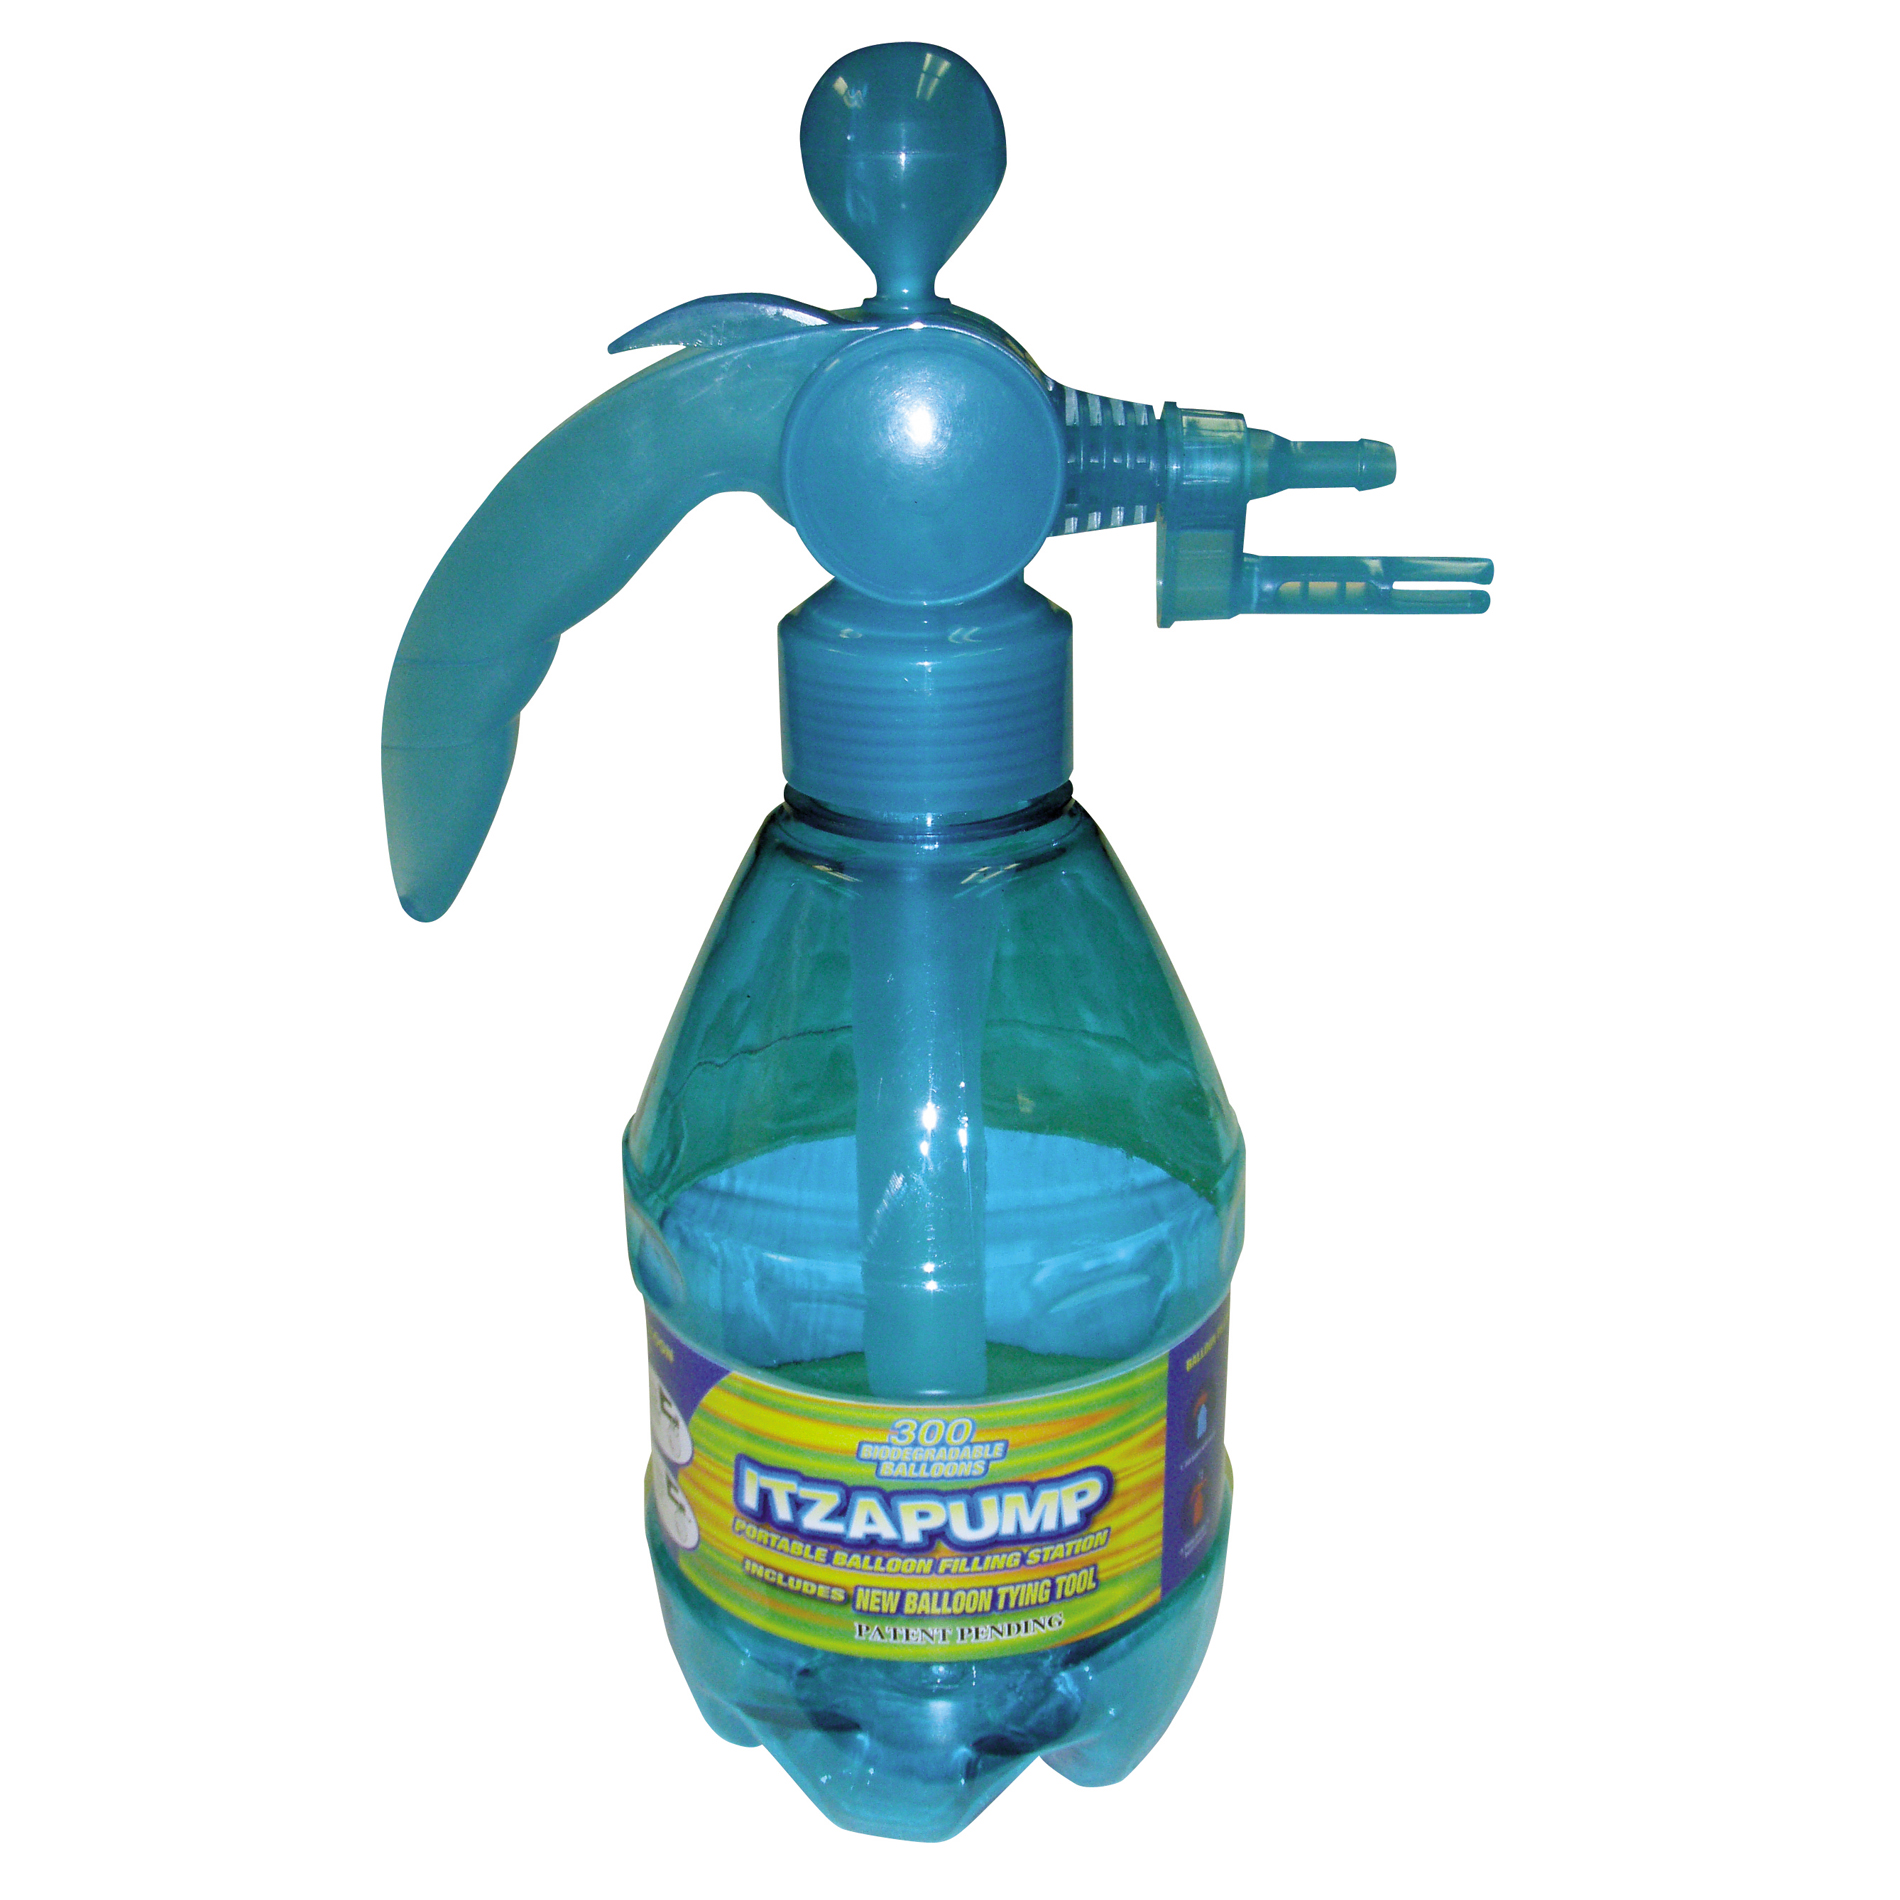 WATER SPORTS, LLC ItzaPump Water Balloon Pump